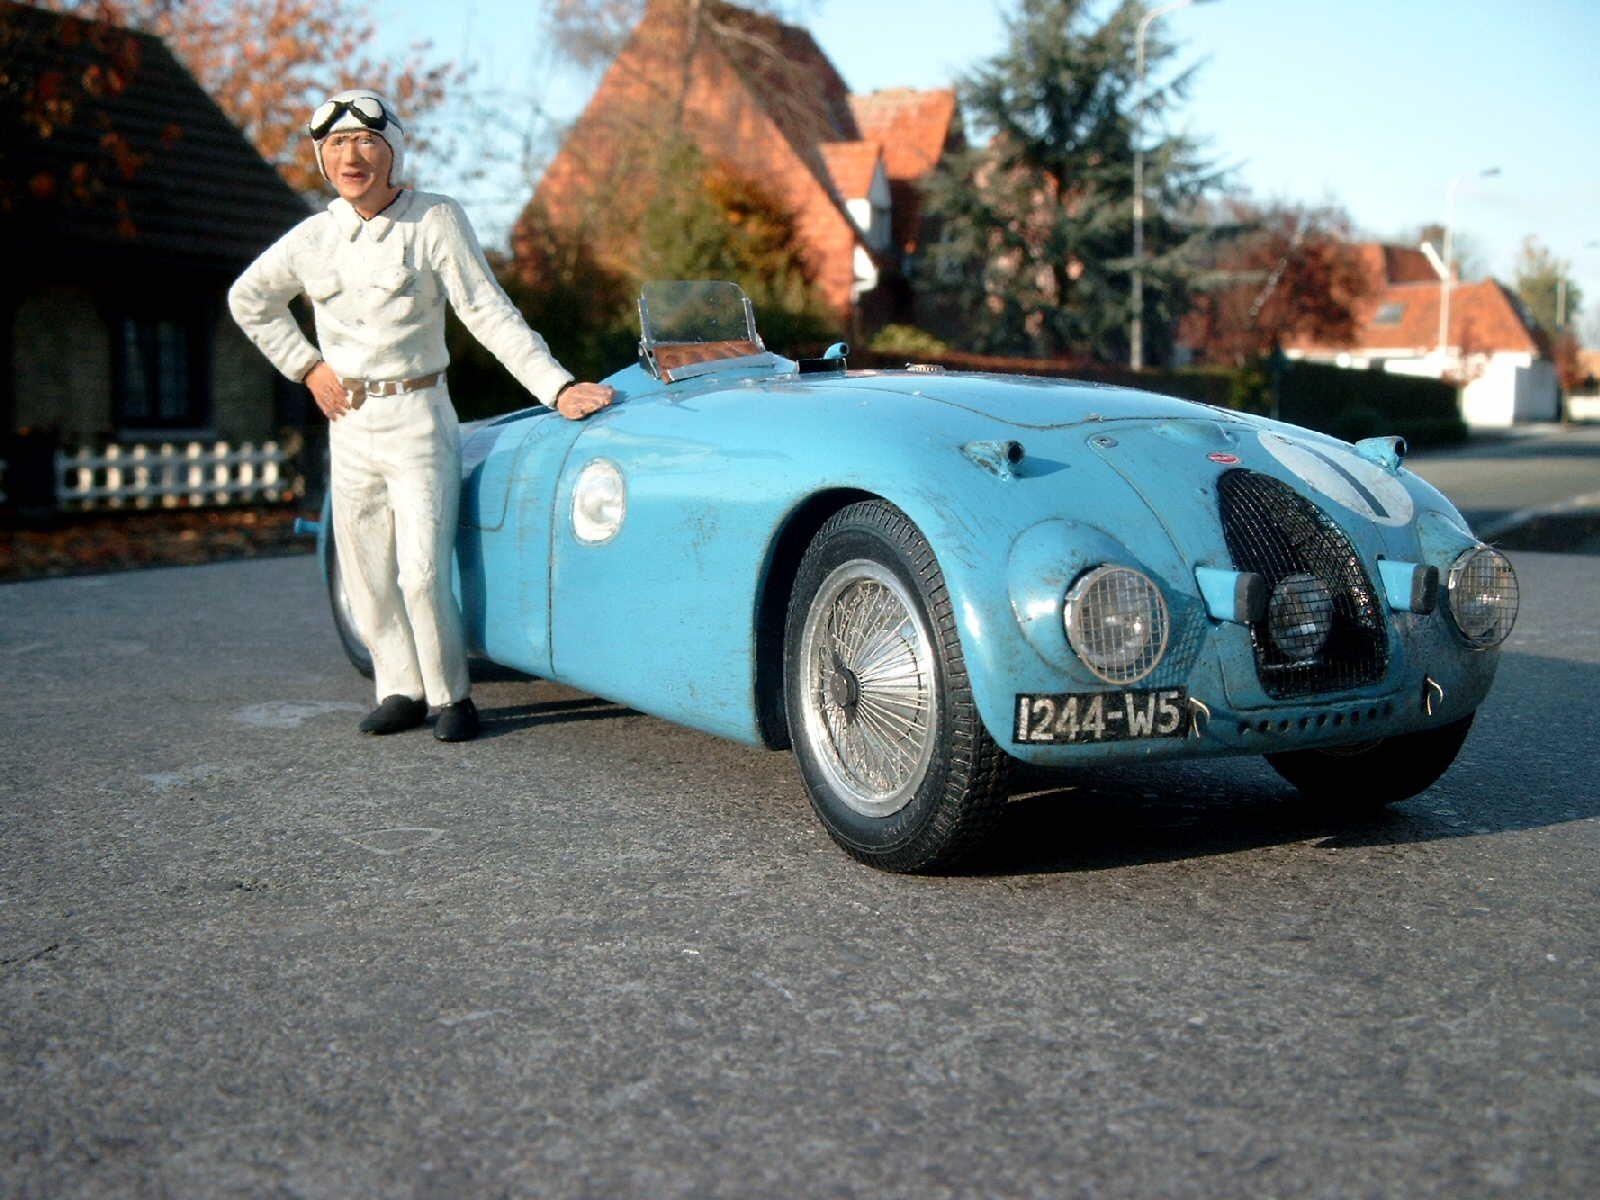 le mans 1937 bugatti type 57s tank 1 roger labric pierre veyron 24h le mans 1937. Black Bedroom Furniture Sets. Home Design Ideas